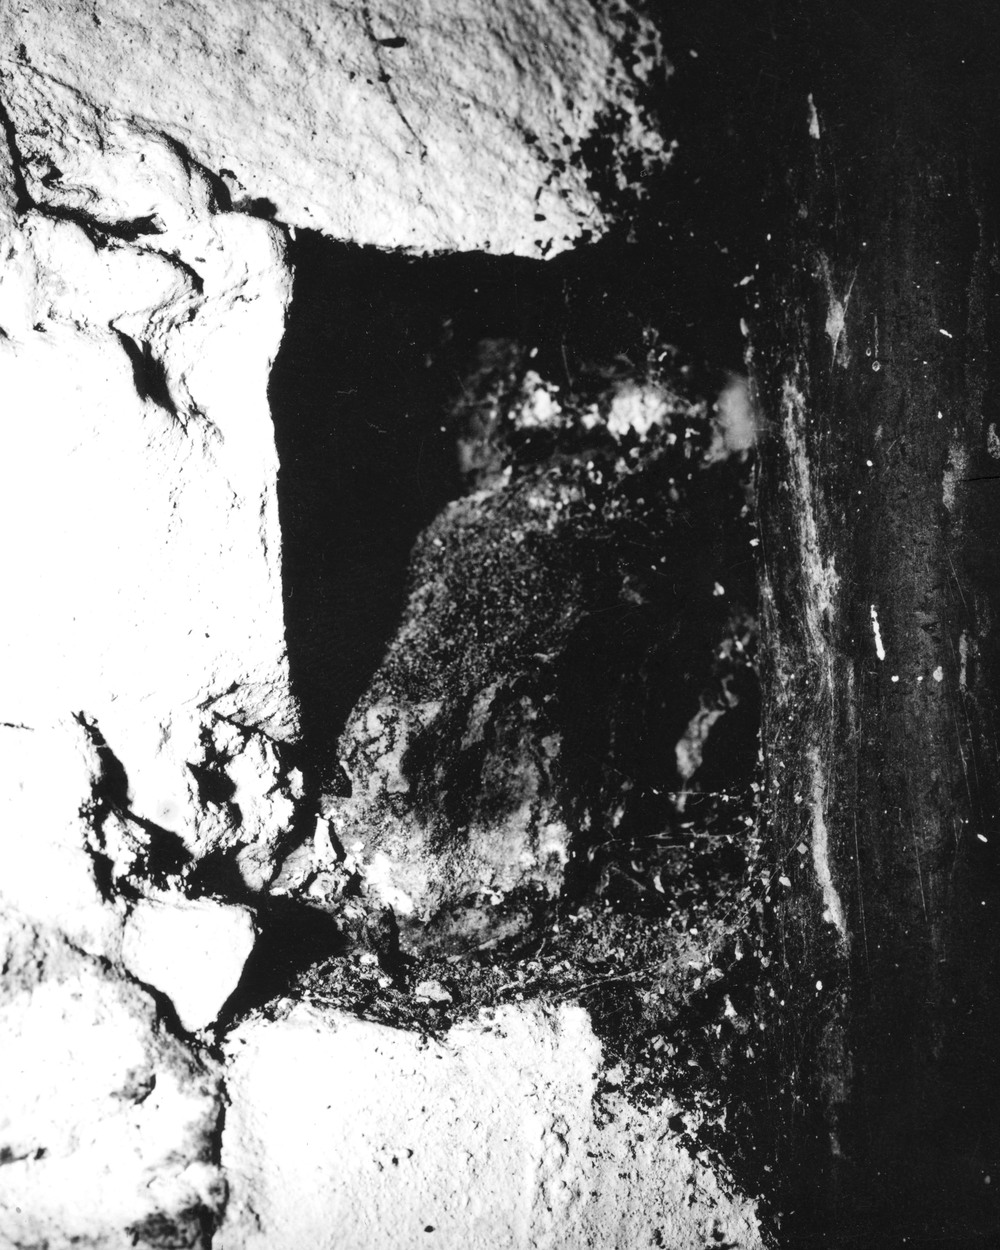 Basementcave3.jpg